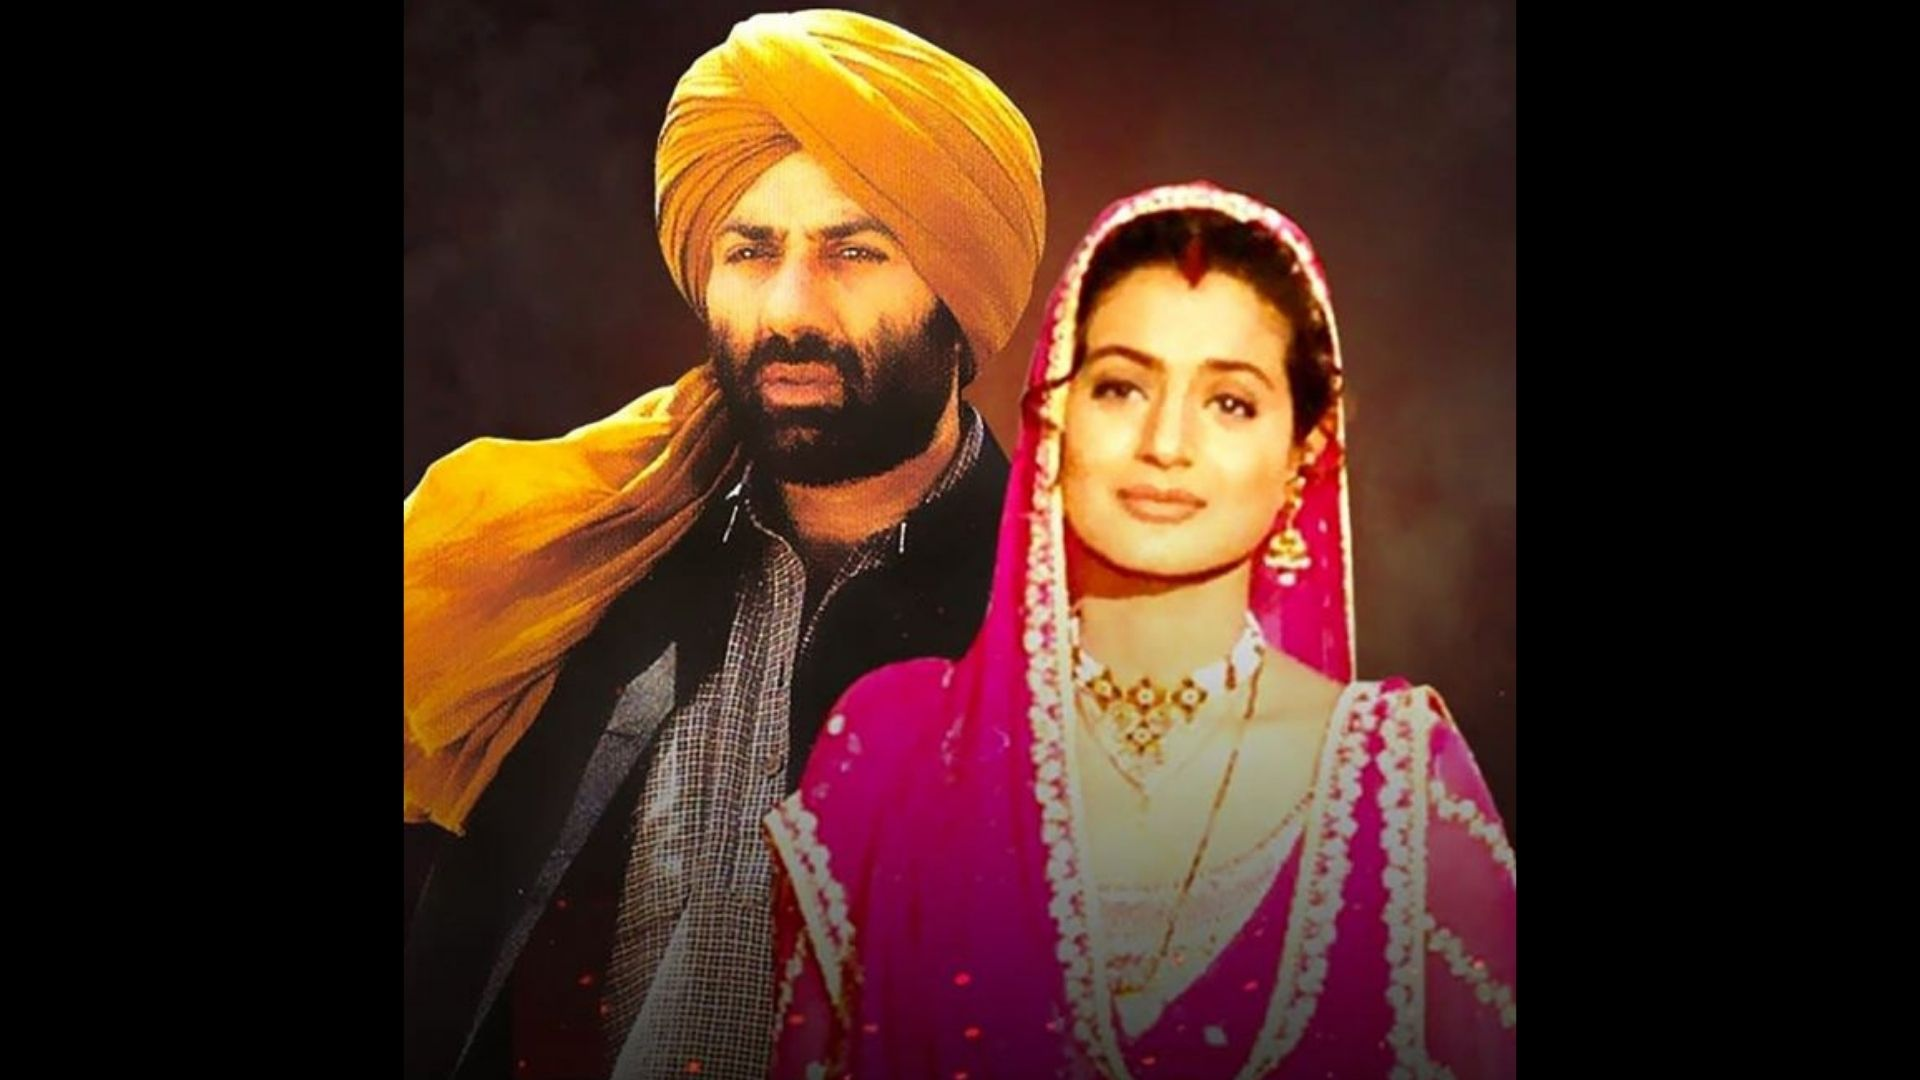 Sunny Deol And Amisha Patel Starrer Gadar 2 In The Making? Actor Drops Major Hints